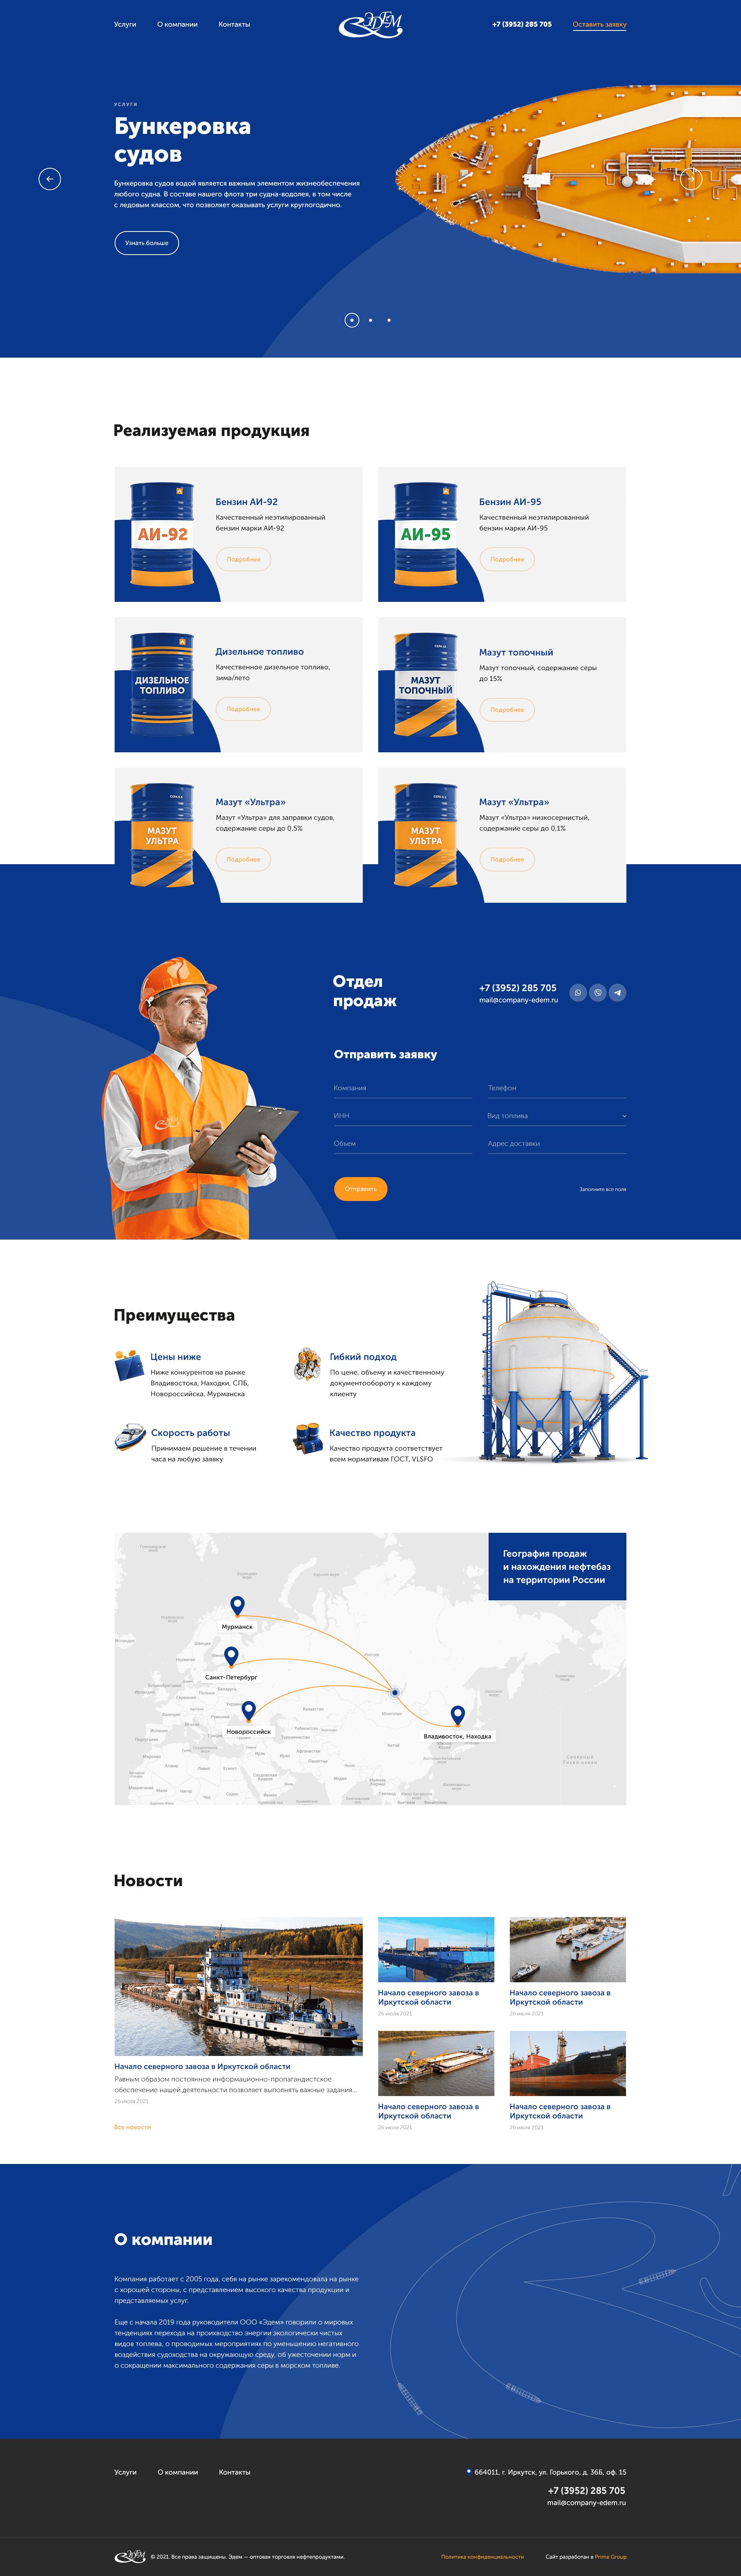 Разработка корпоративного сайта Company-edem.ru